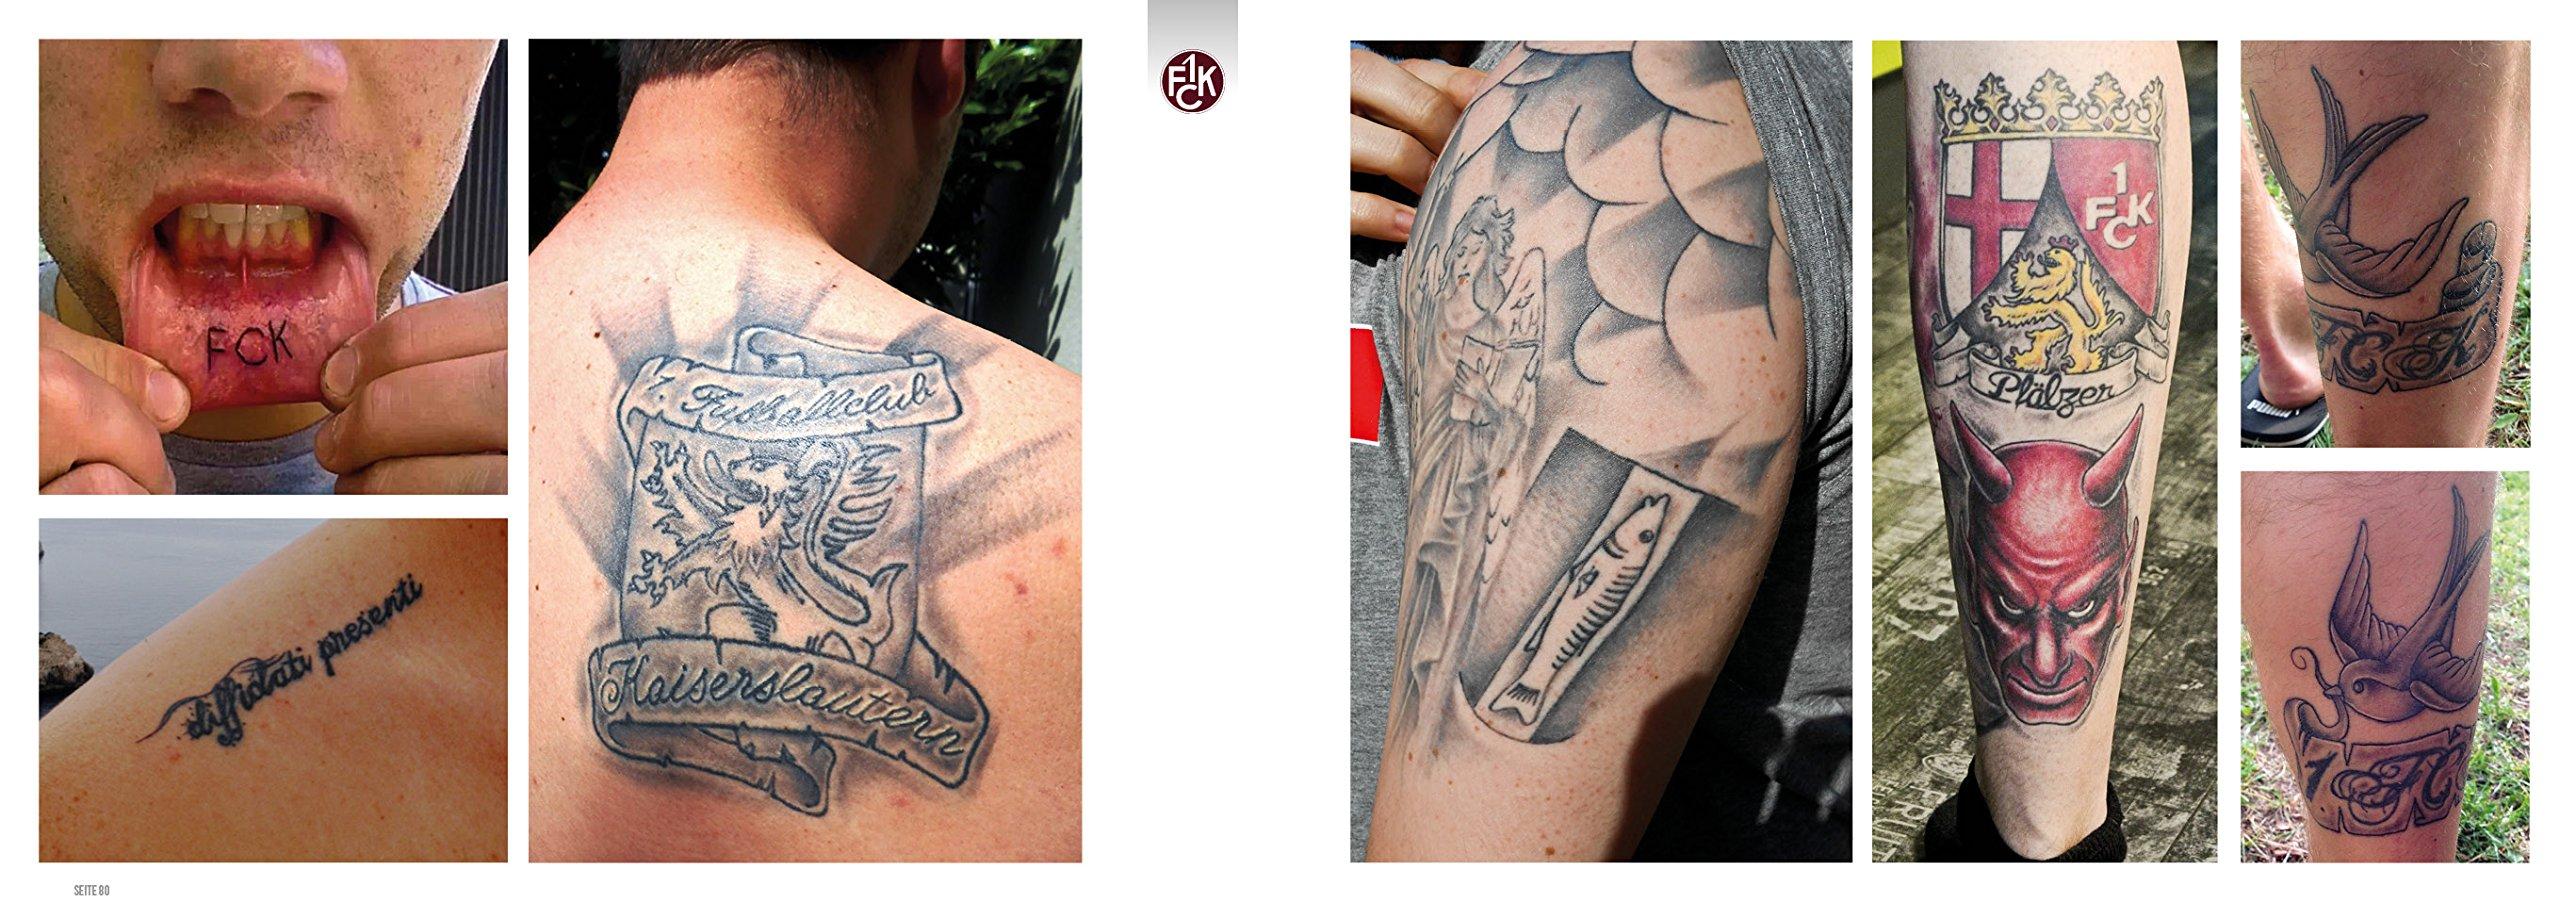 Blickfang Ultra Tattoo Spezial Alexander Burkhardt Jonas